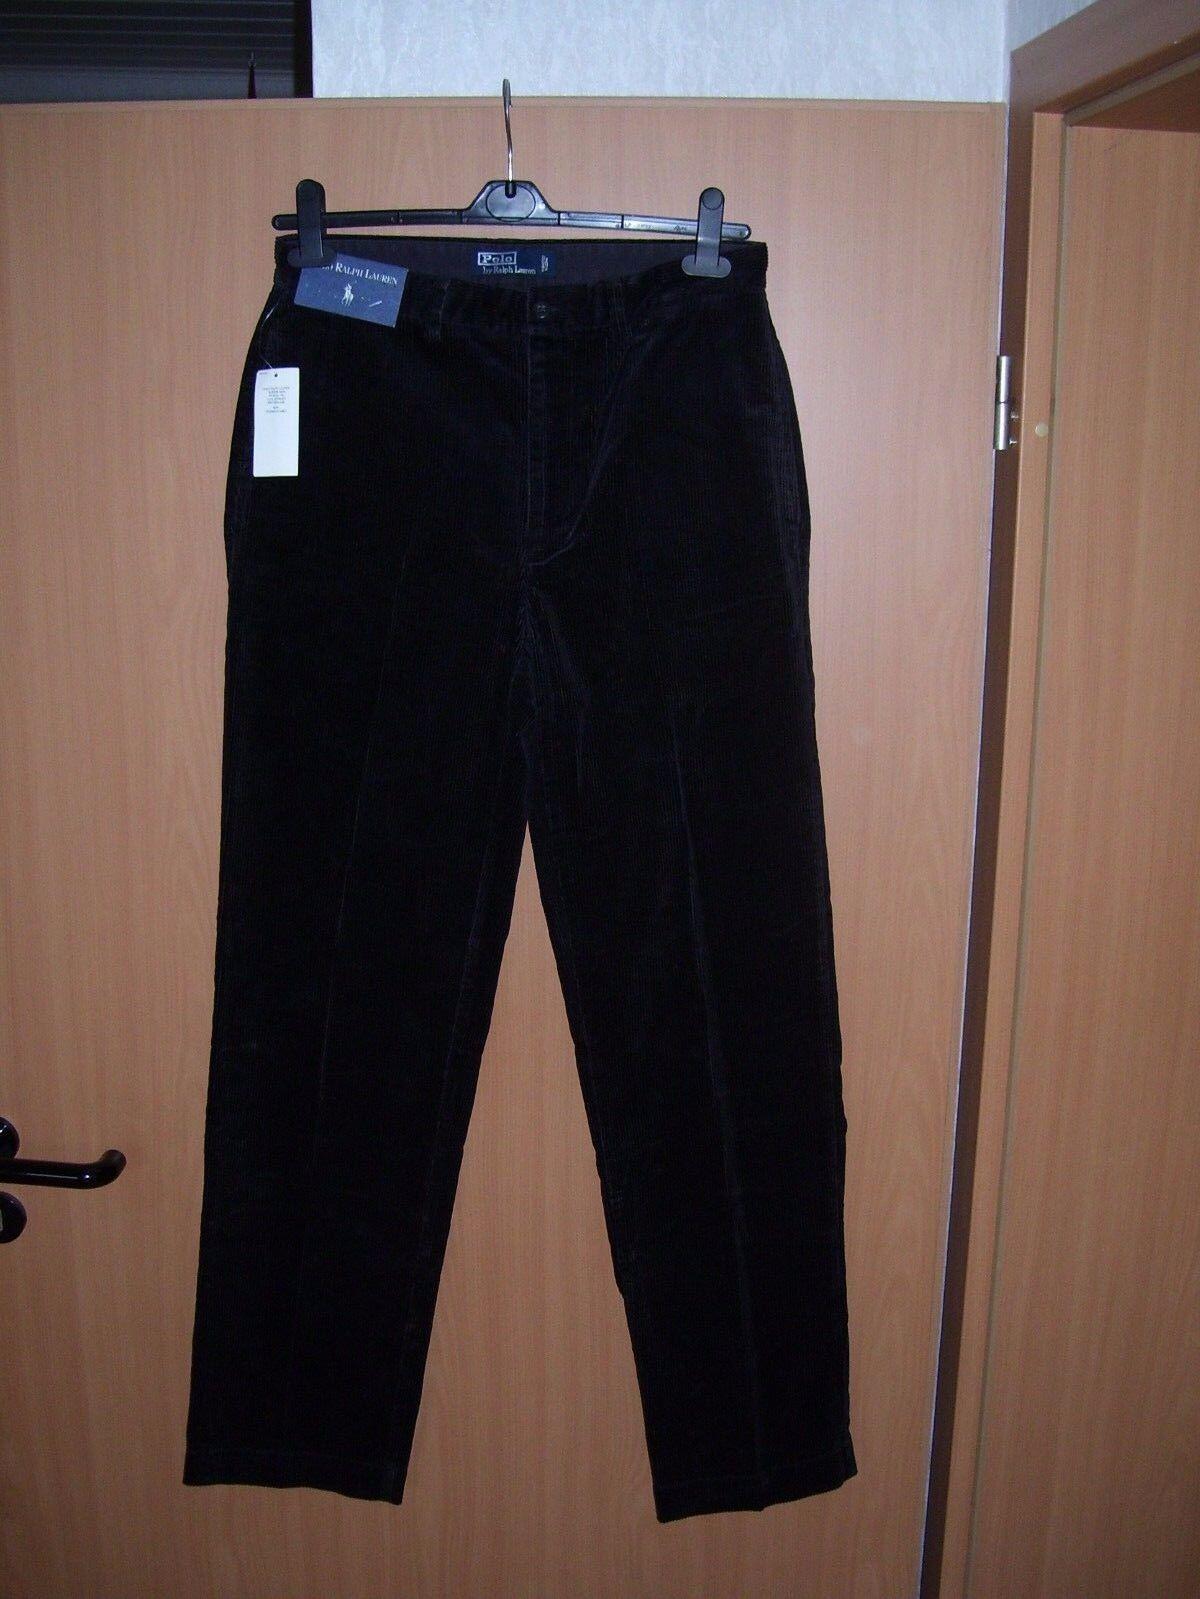 Polo Ralph Lauren Herren Cord Hose Cordhose mit Bügelfalte schwarz W32 L34 neu